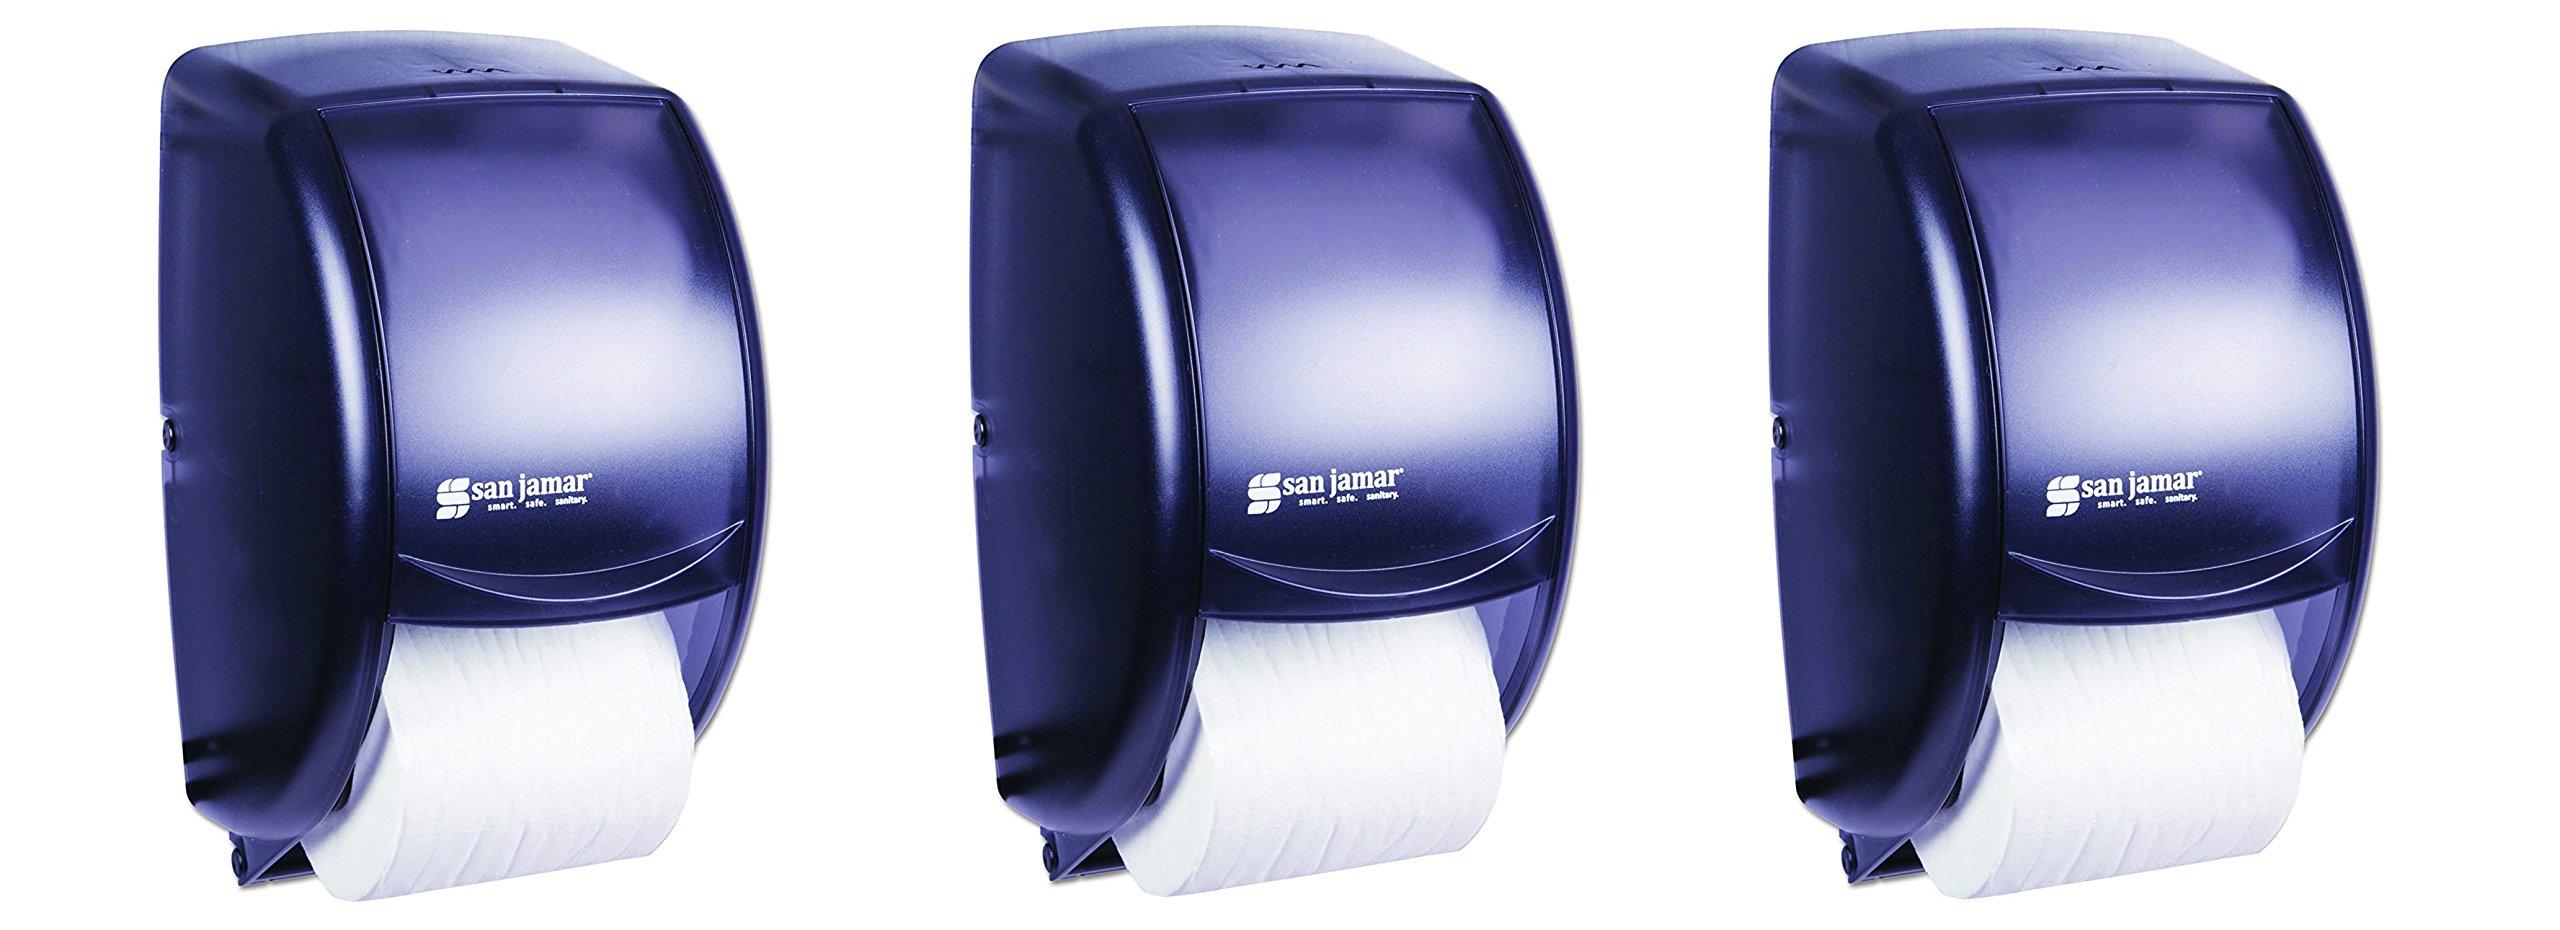 San Jamar R3500TBK Black Pearl Duett Standard Bath Tissue Dispenser (3.PACK)